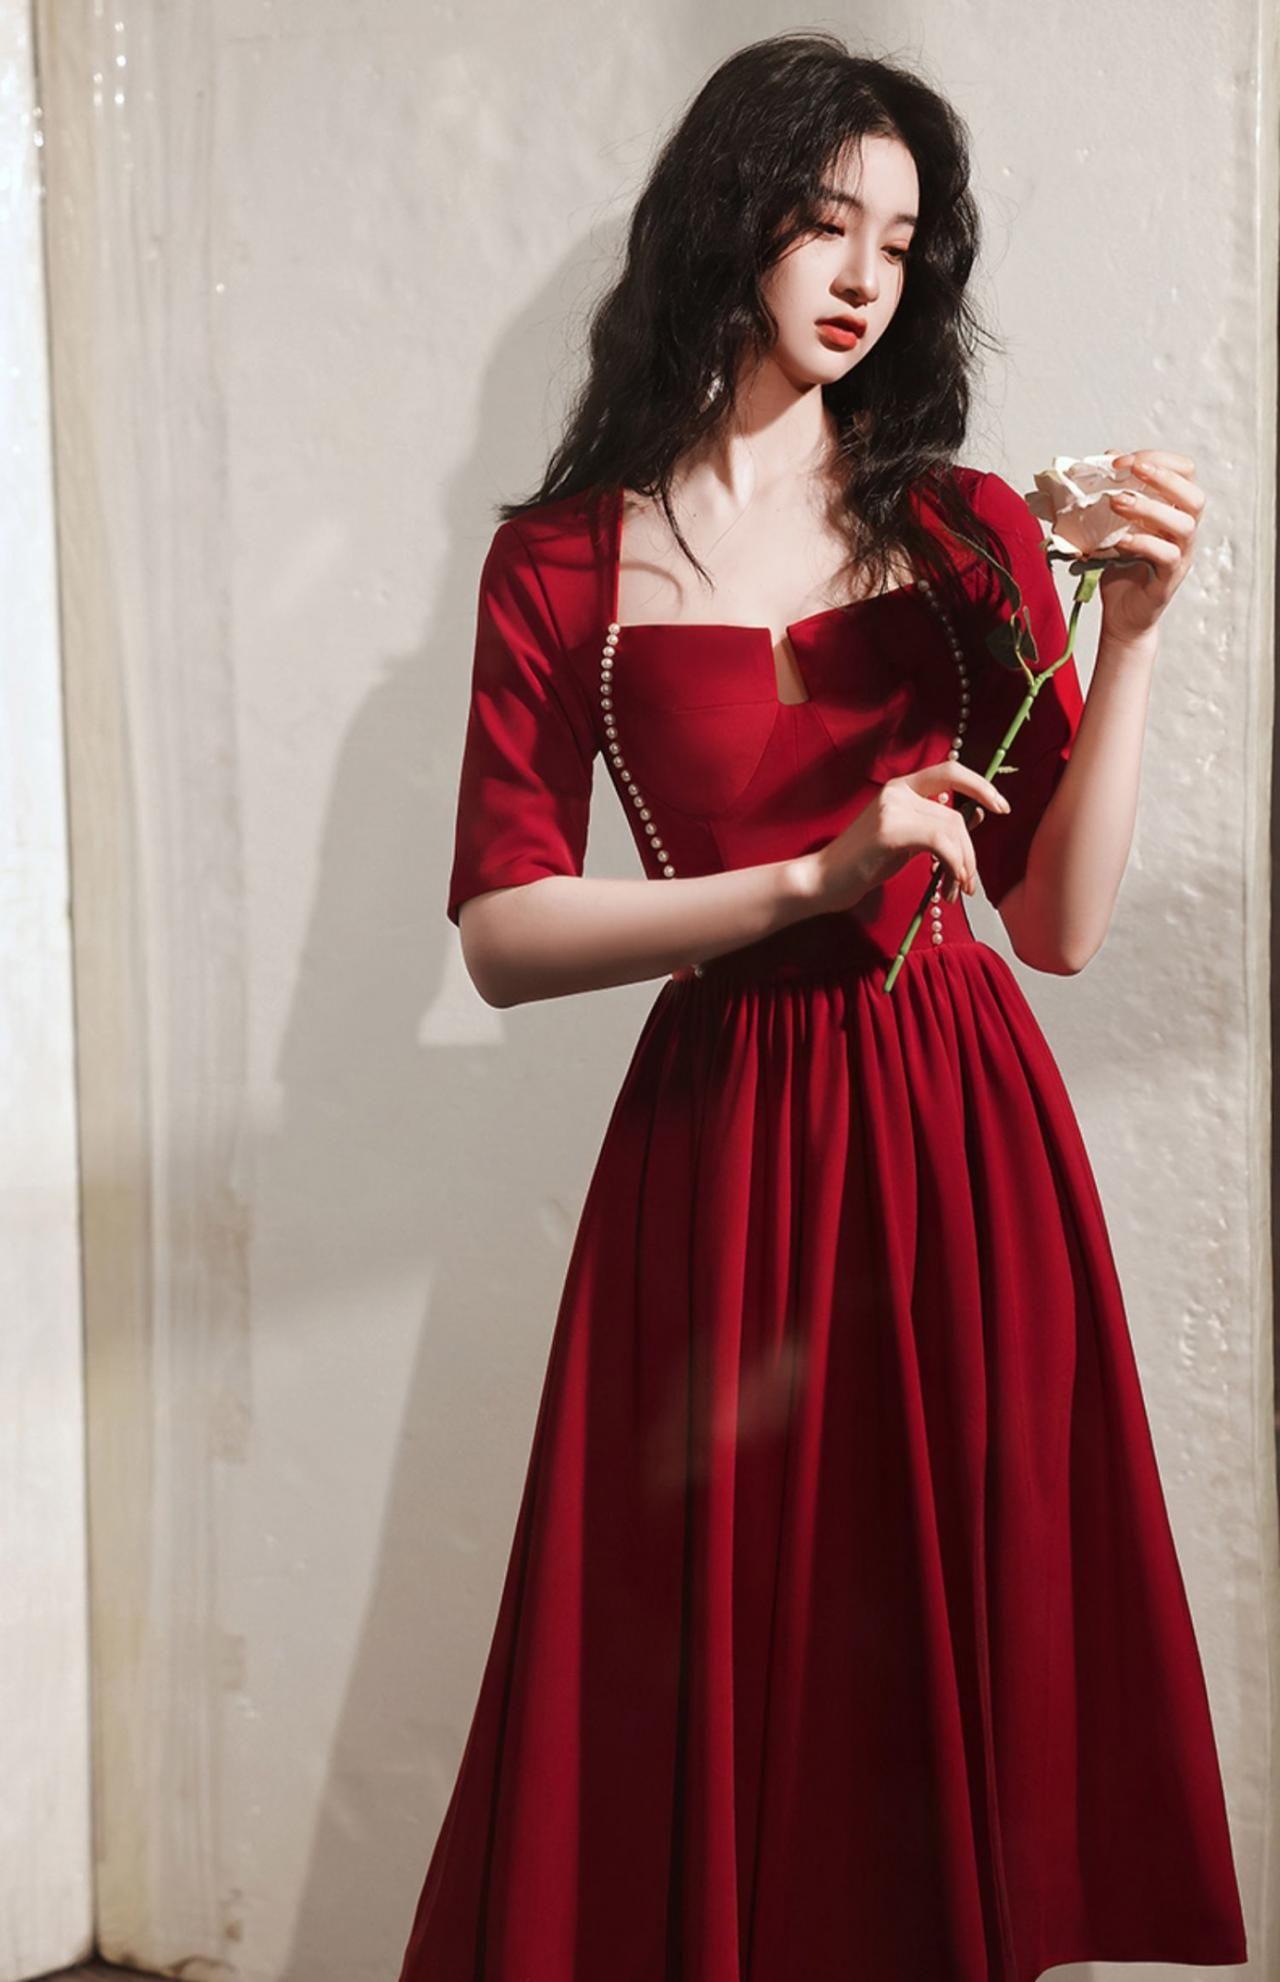 New Red Midi Dress Long Sleeve Red Dress Vintage Dress Custom Made In 2021 Red Long Sleeve Midi Dress Red Midi Dress Red Long Sleeve Dress [ 1982 x 1280 Pixel ]